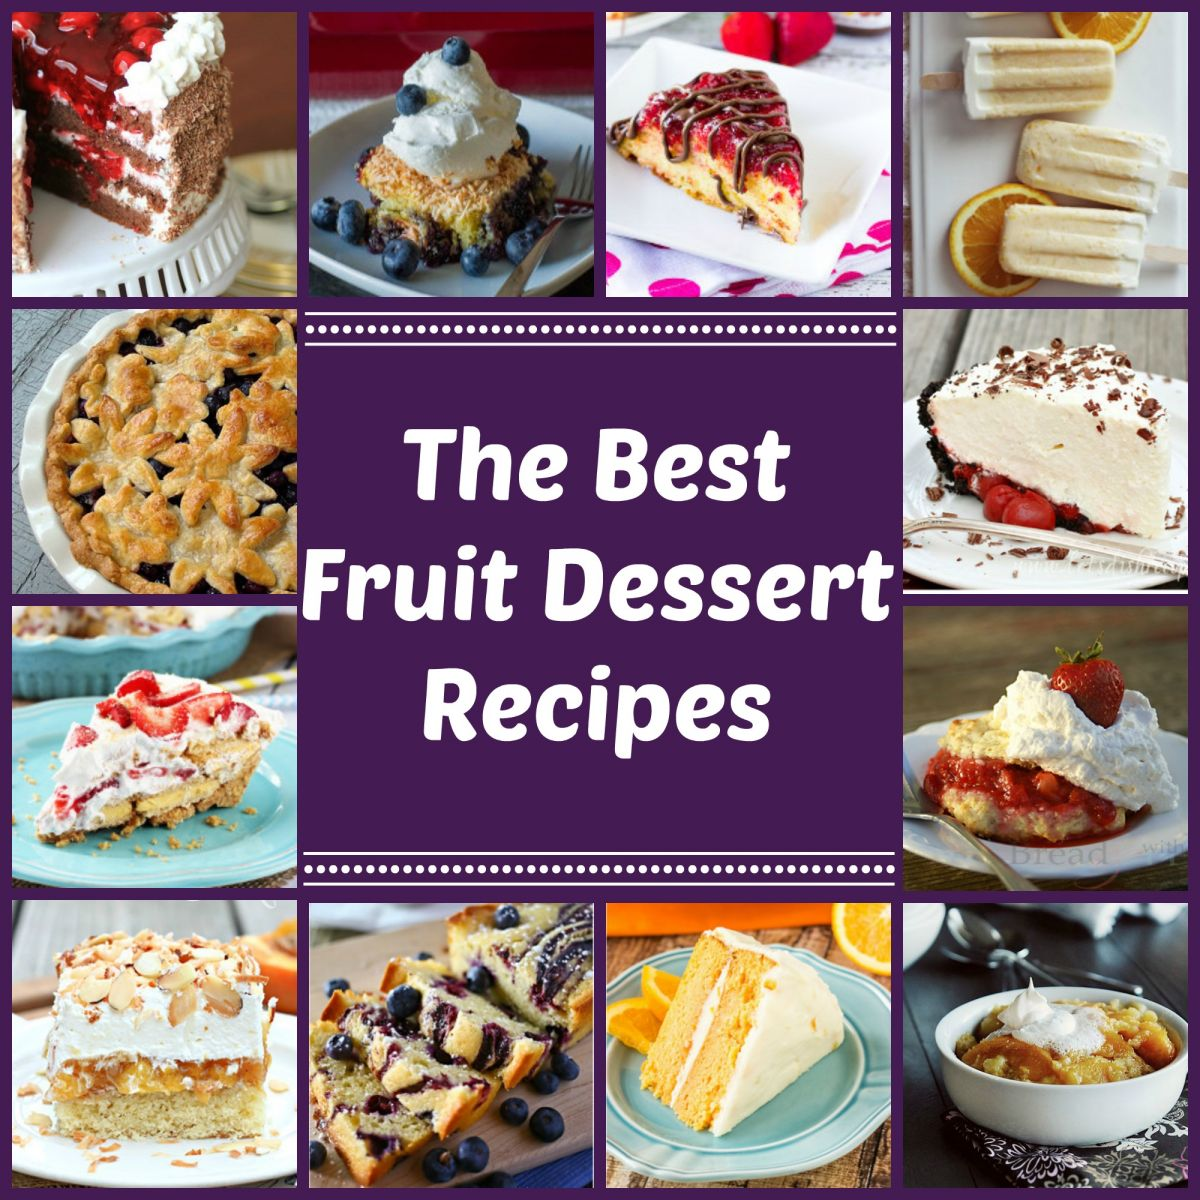 Irresistible Fruit Desserts: 217 Fruit Dessert Recipes